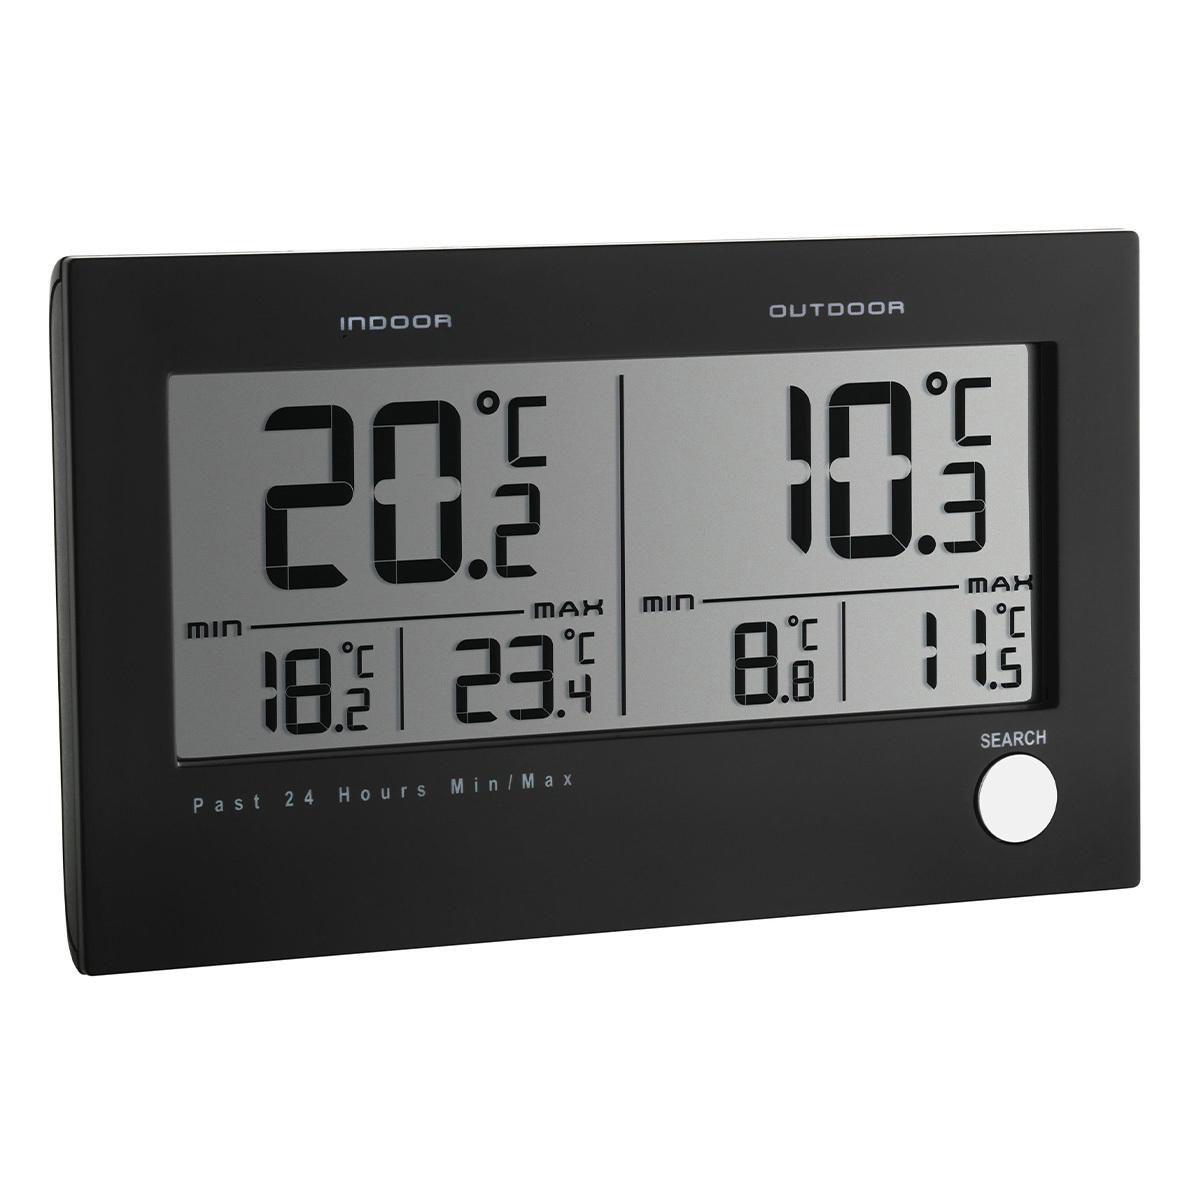 30-3048-funk-thermometer-twin-1200x1200px.jpg